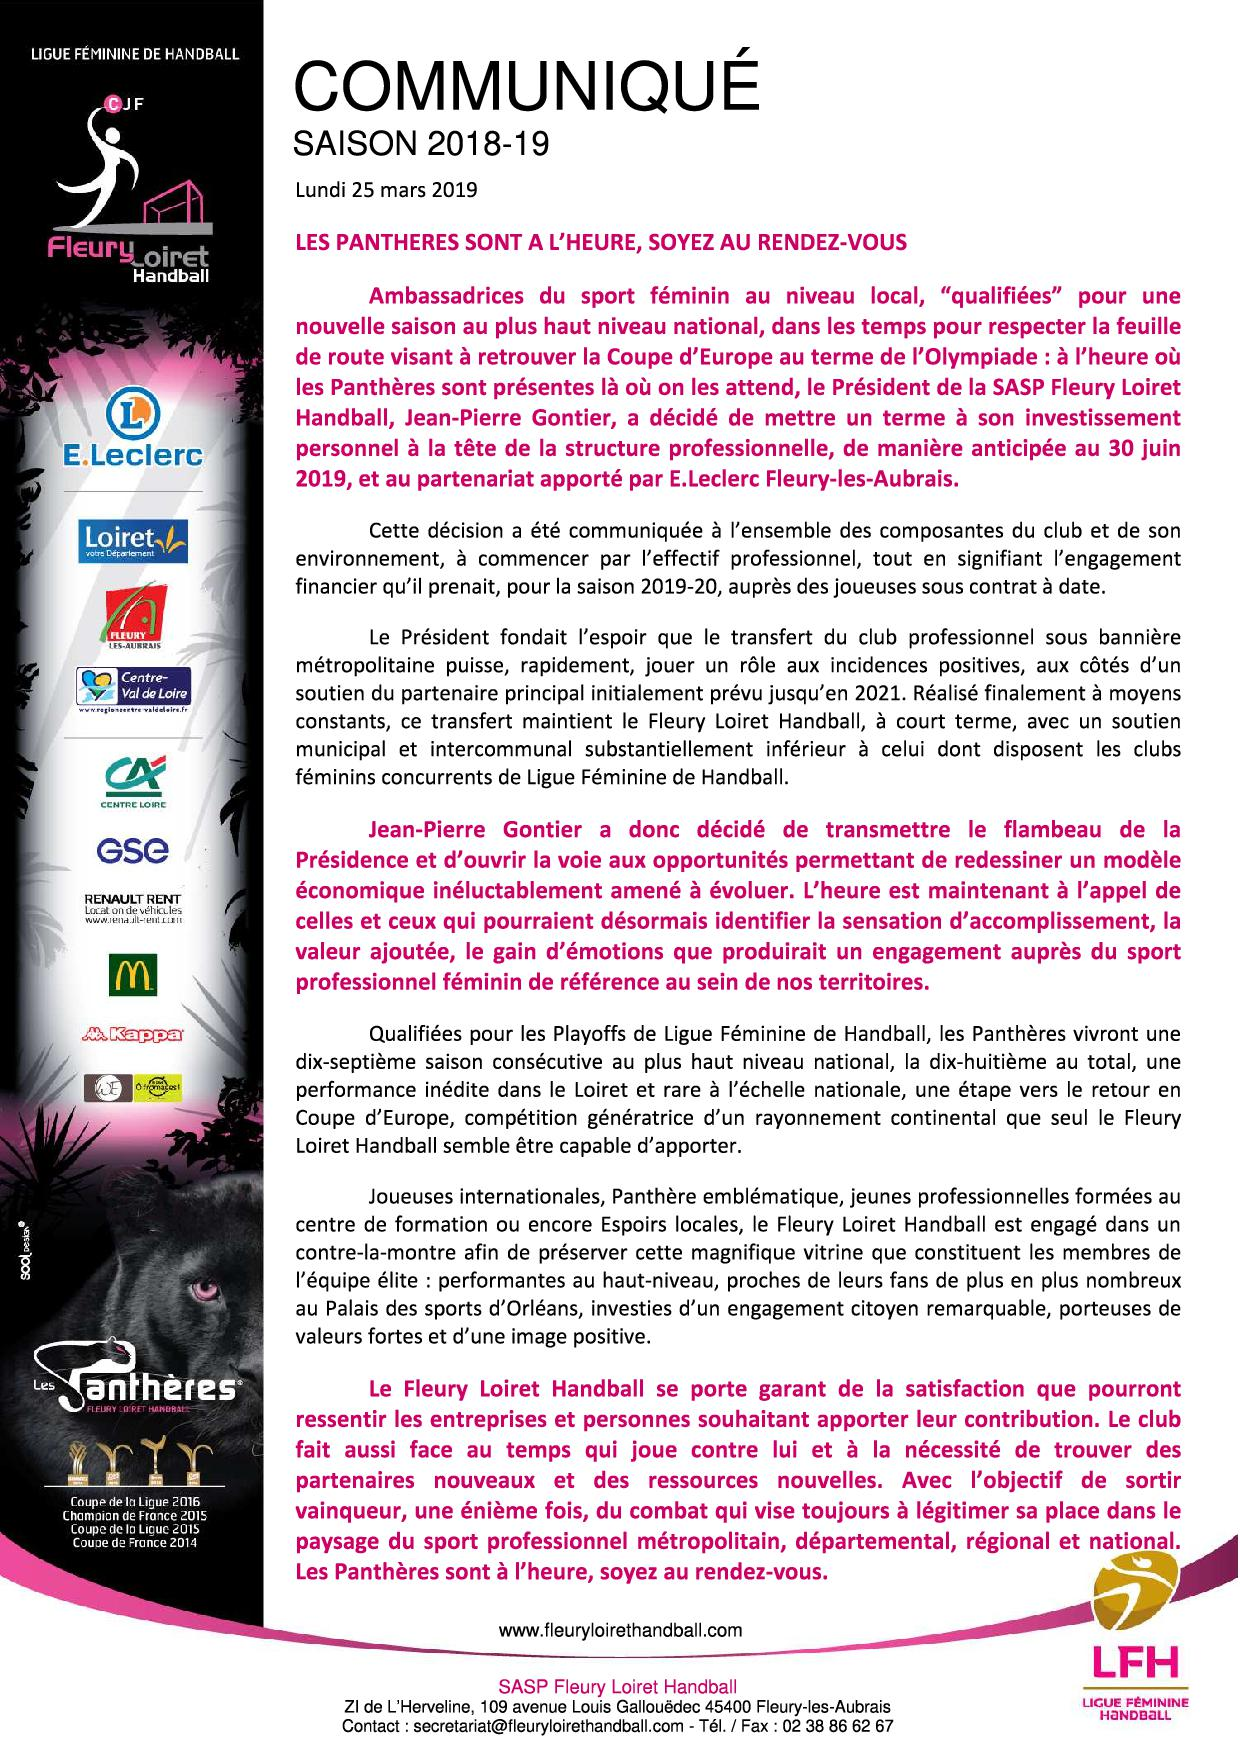 Communiqué Fleury Loiret Handball - Lundi 25 mars 2019 - Communiqué Fleury Loiret Handball - Lundi 25 mars 2019.jpg